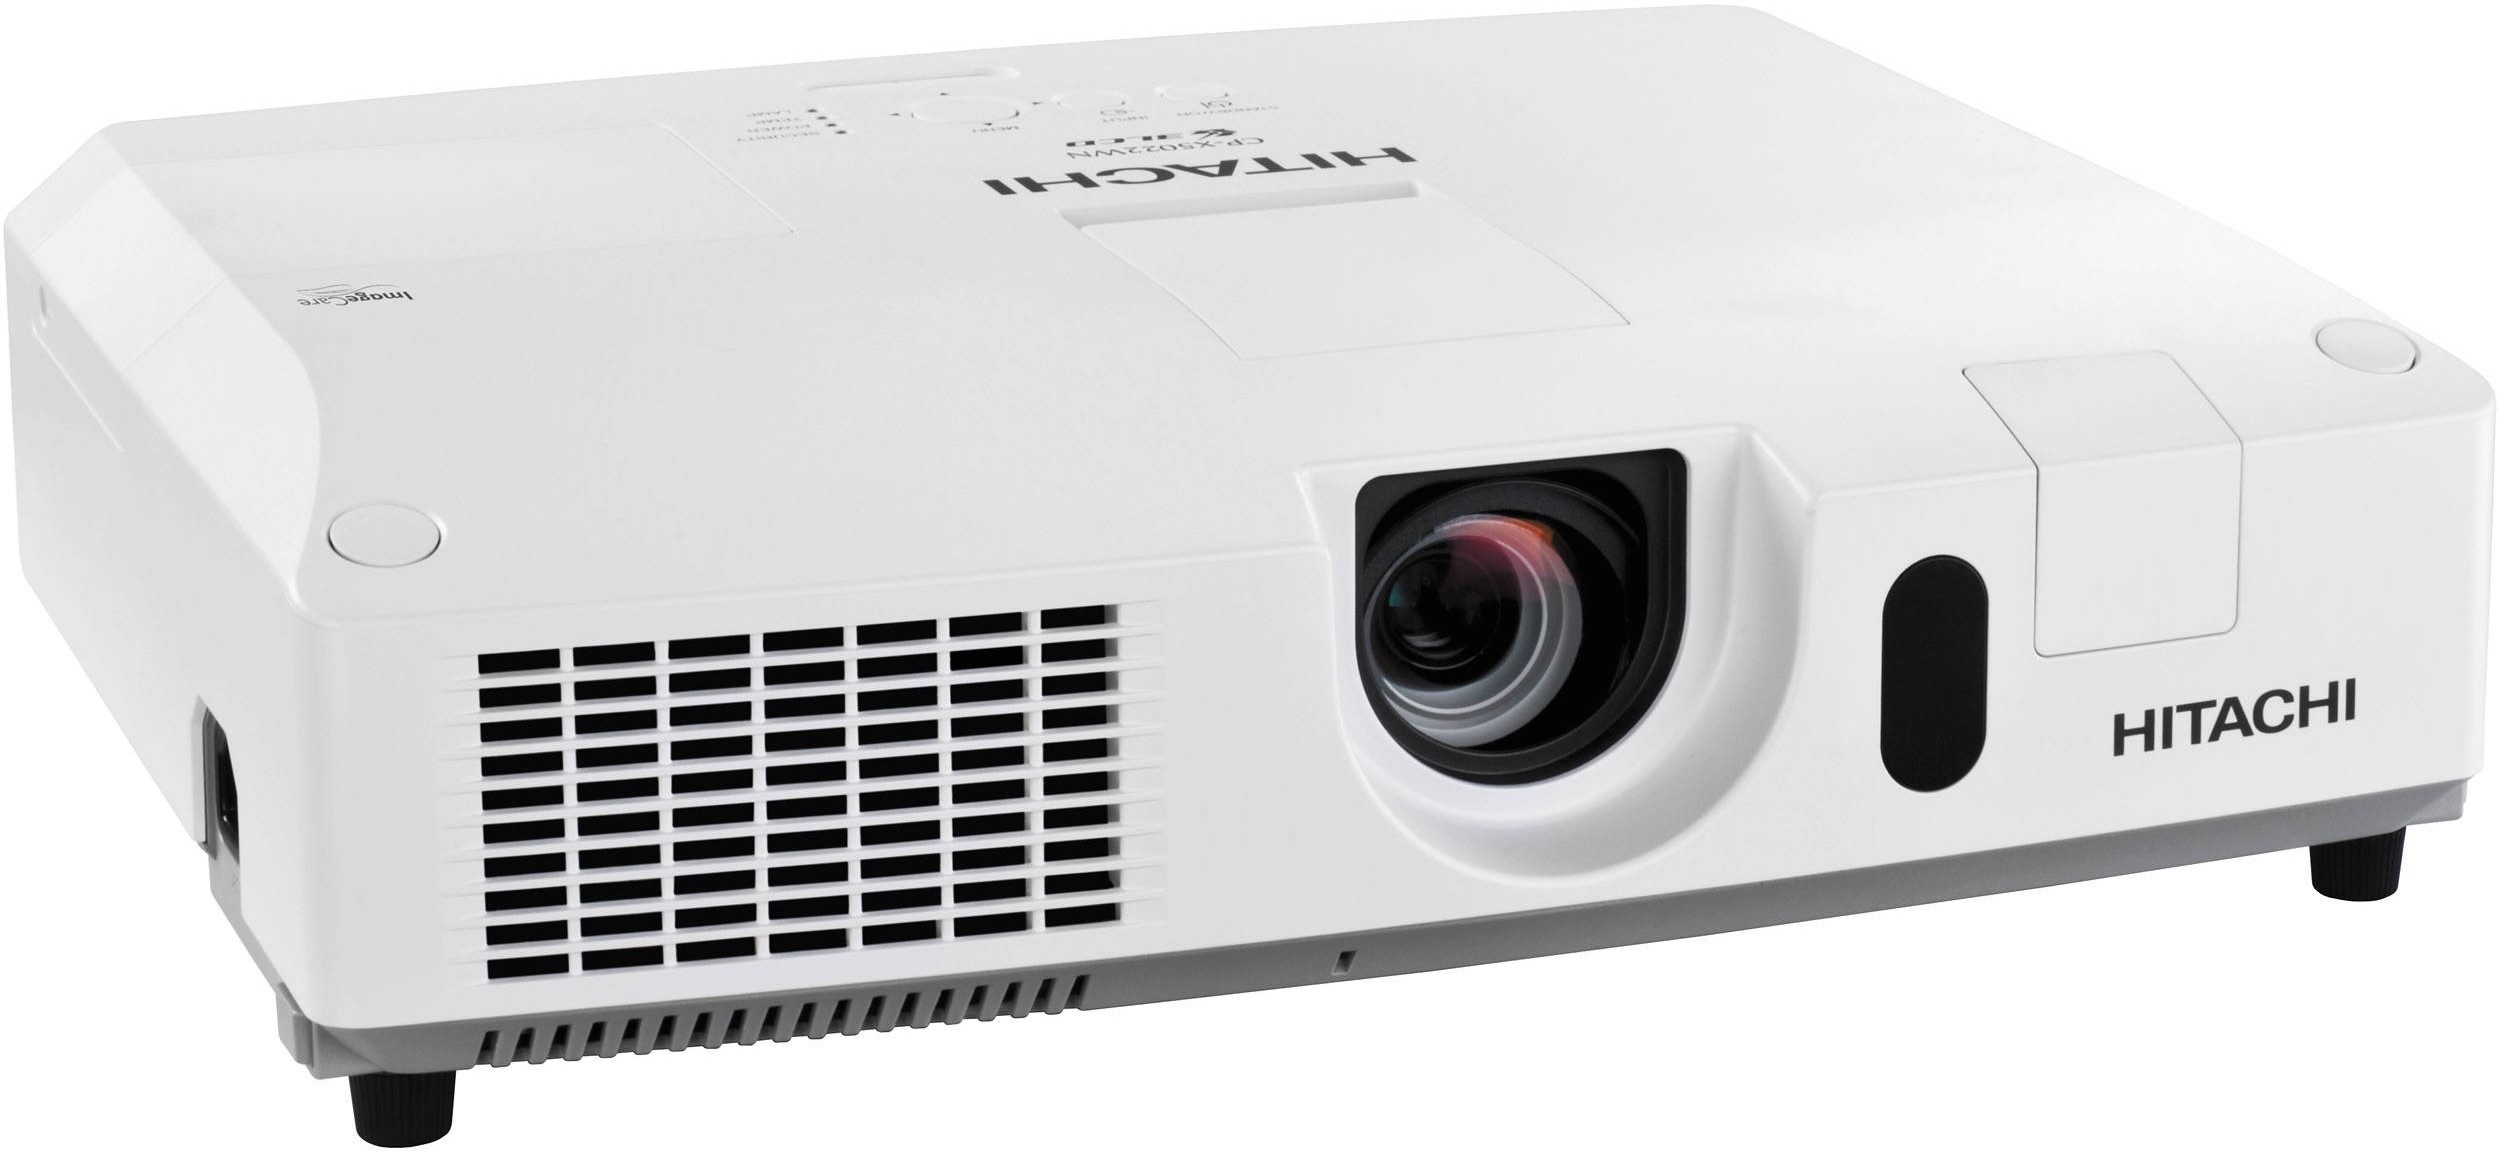 Hitachi ED-27X Portable Projector